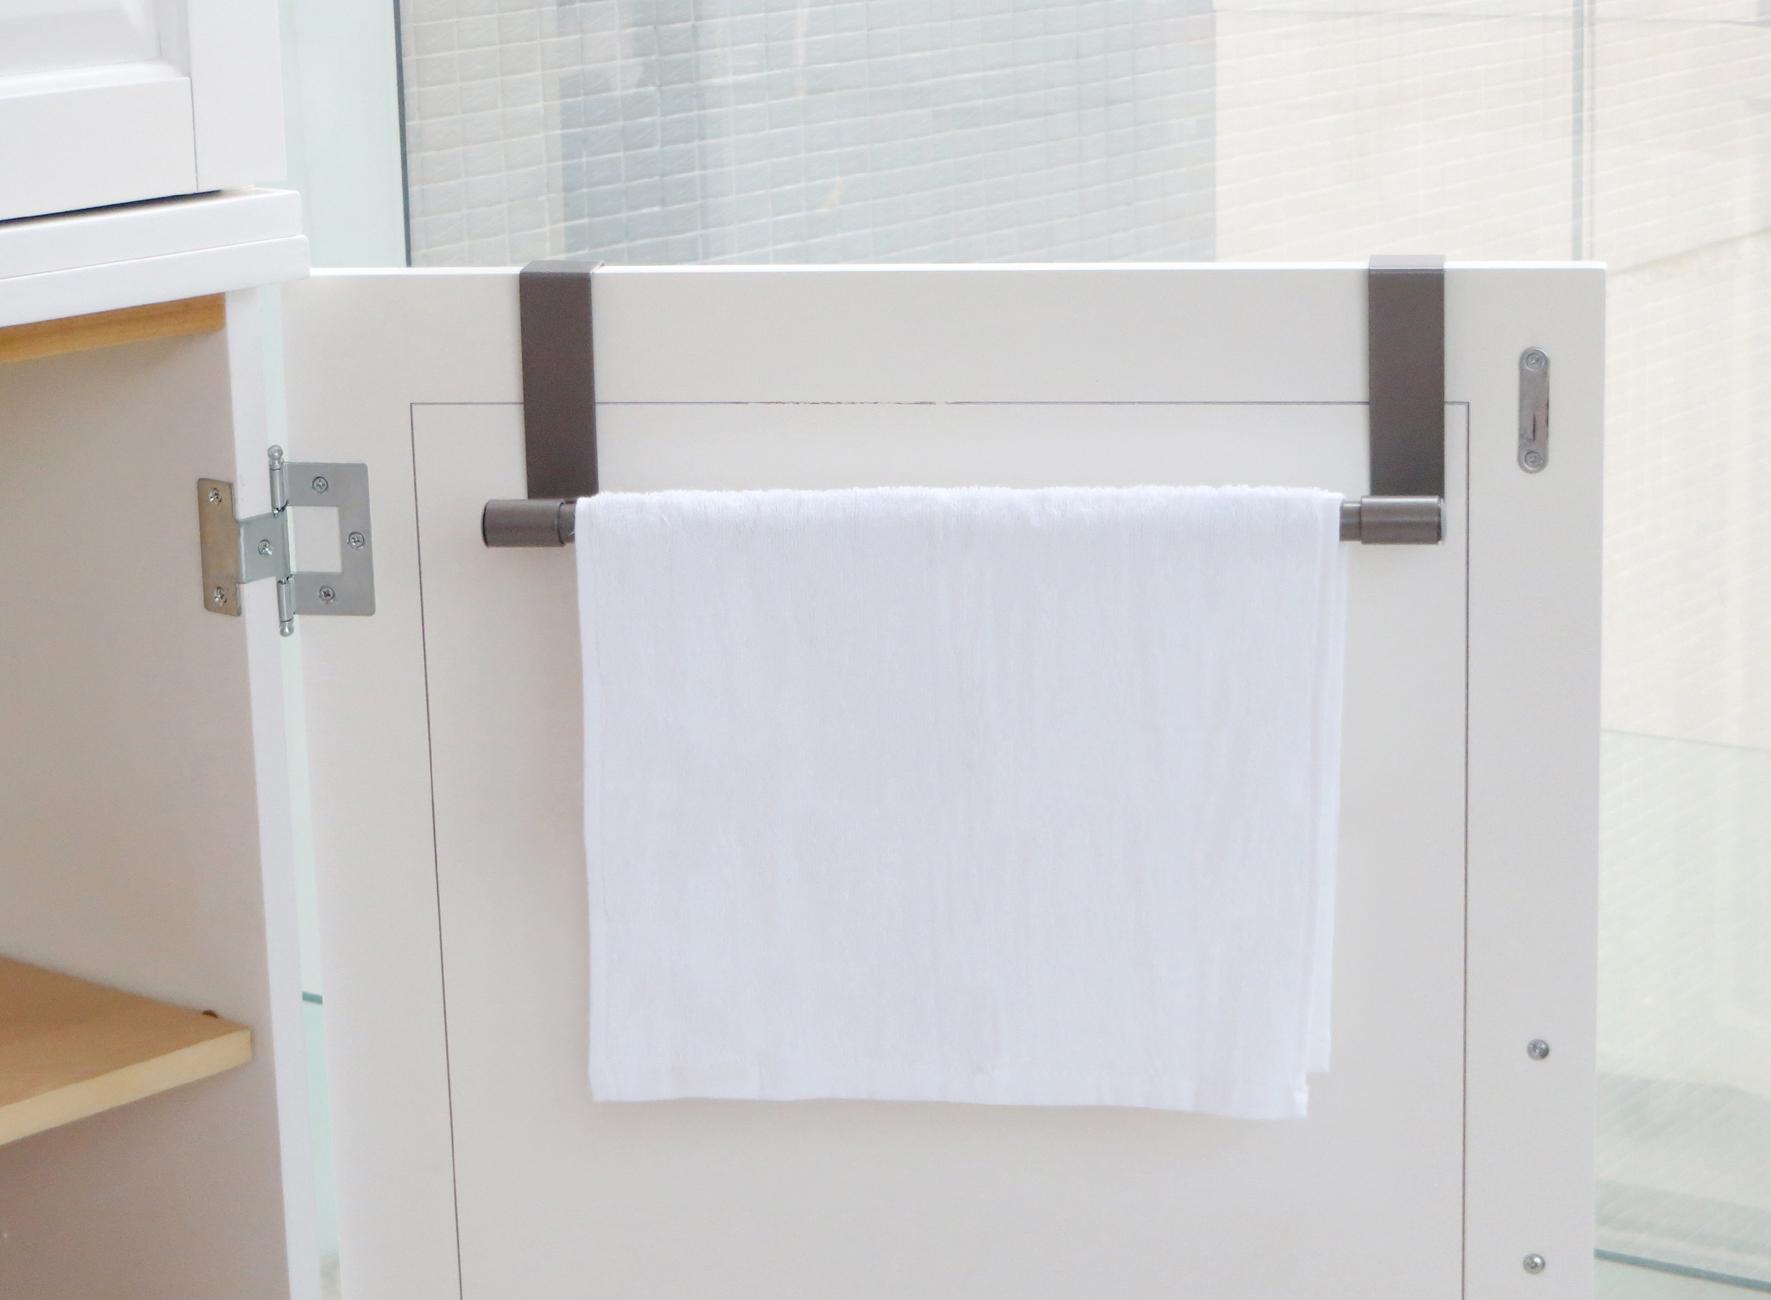 Towel rod photo 2016.6.7.jpg